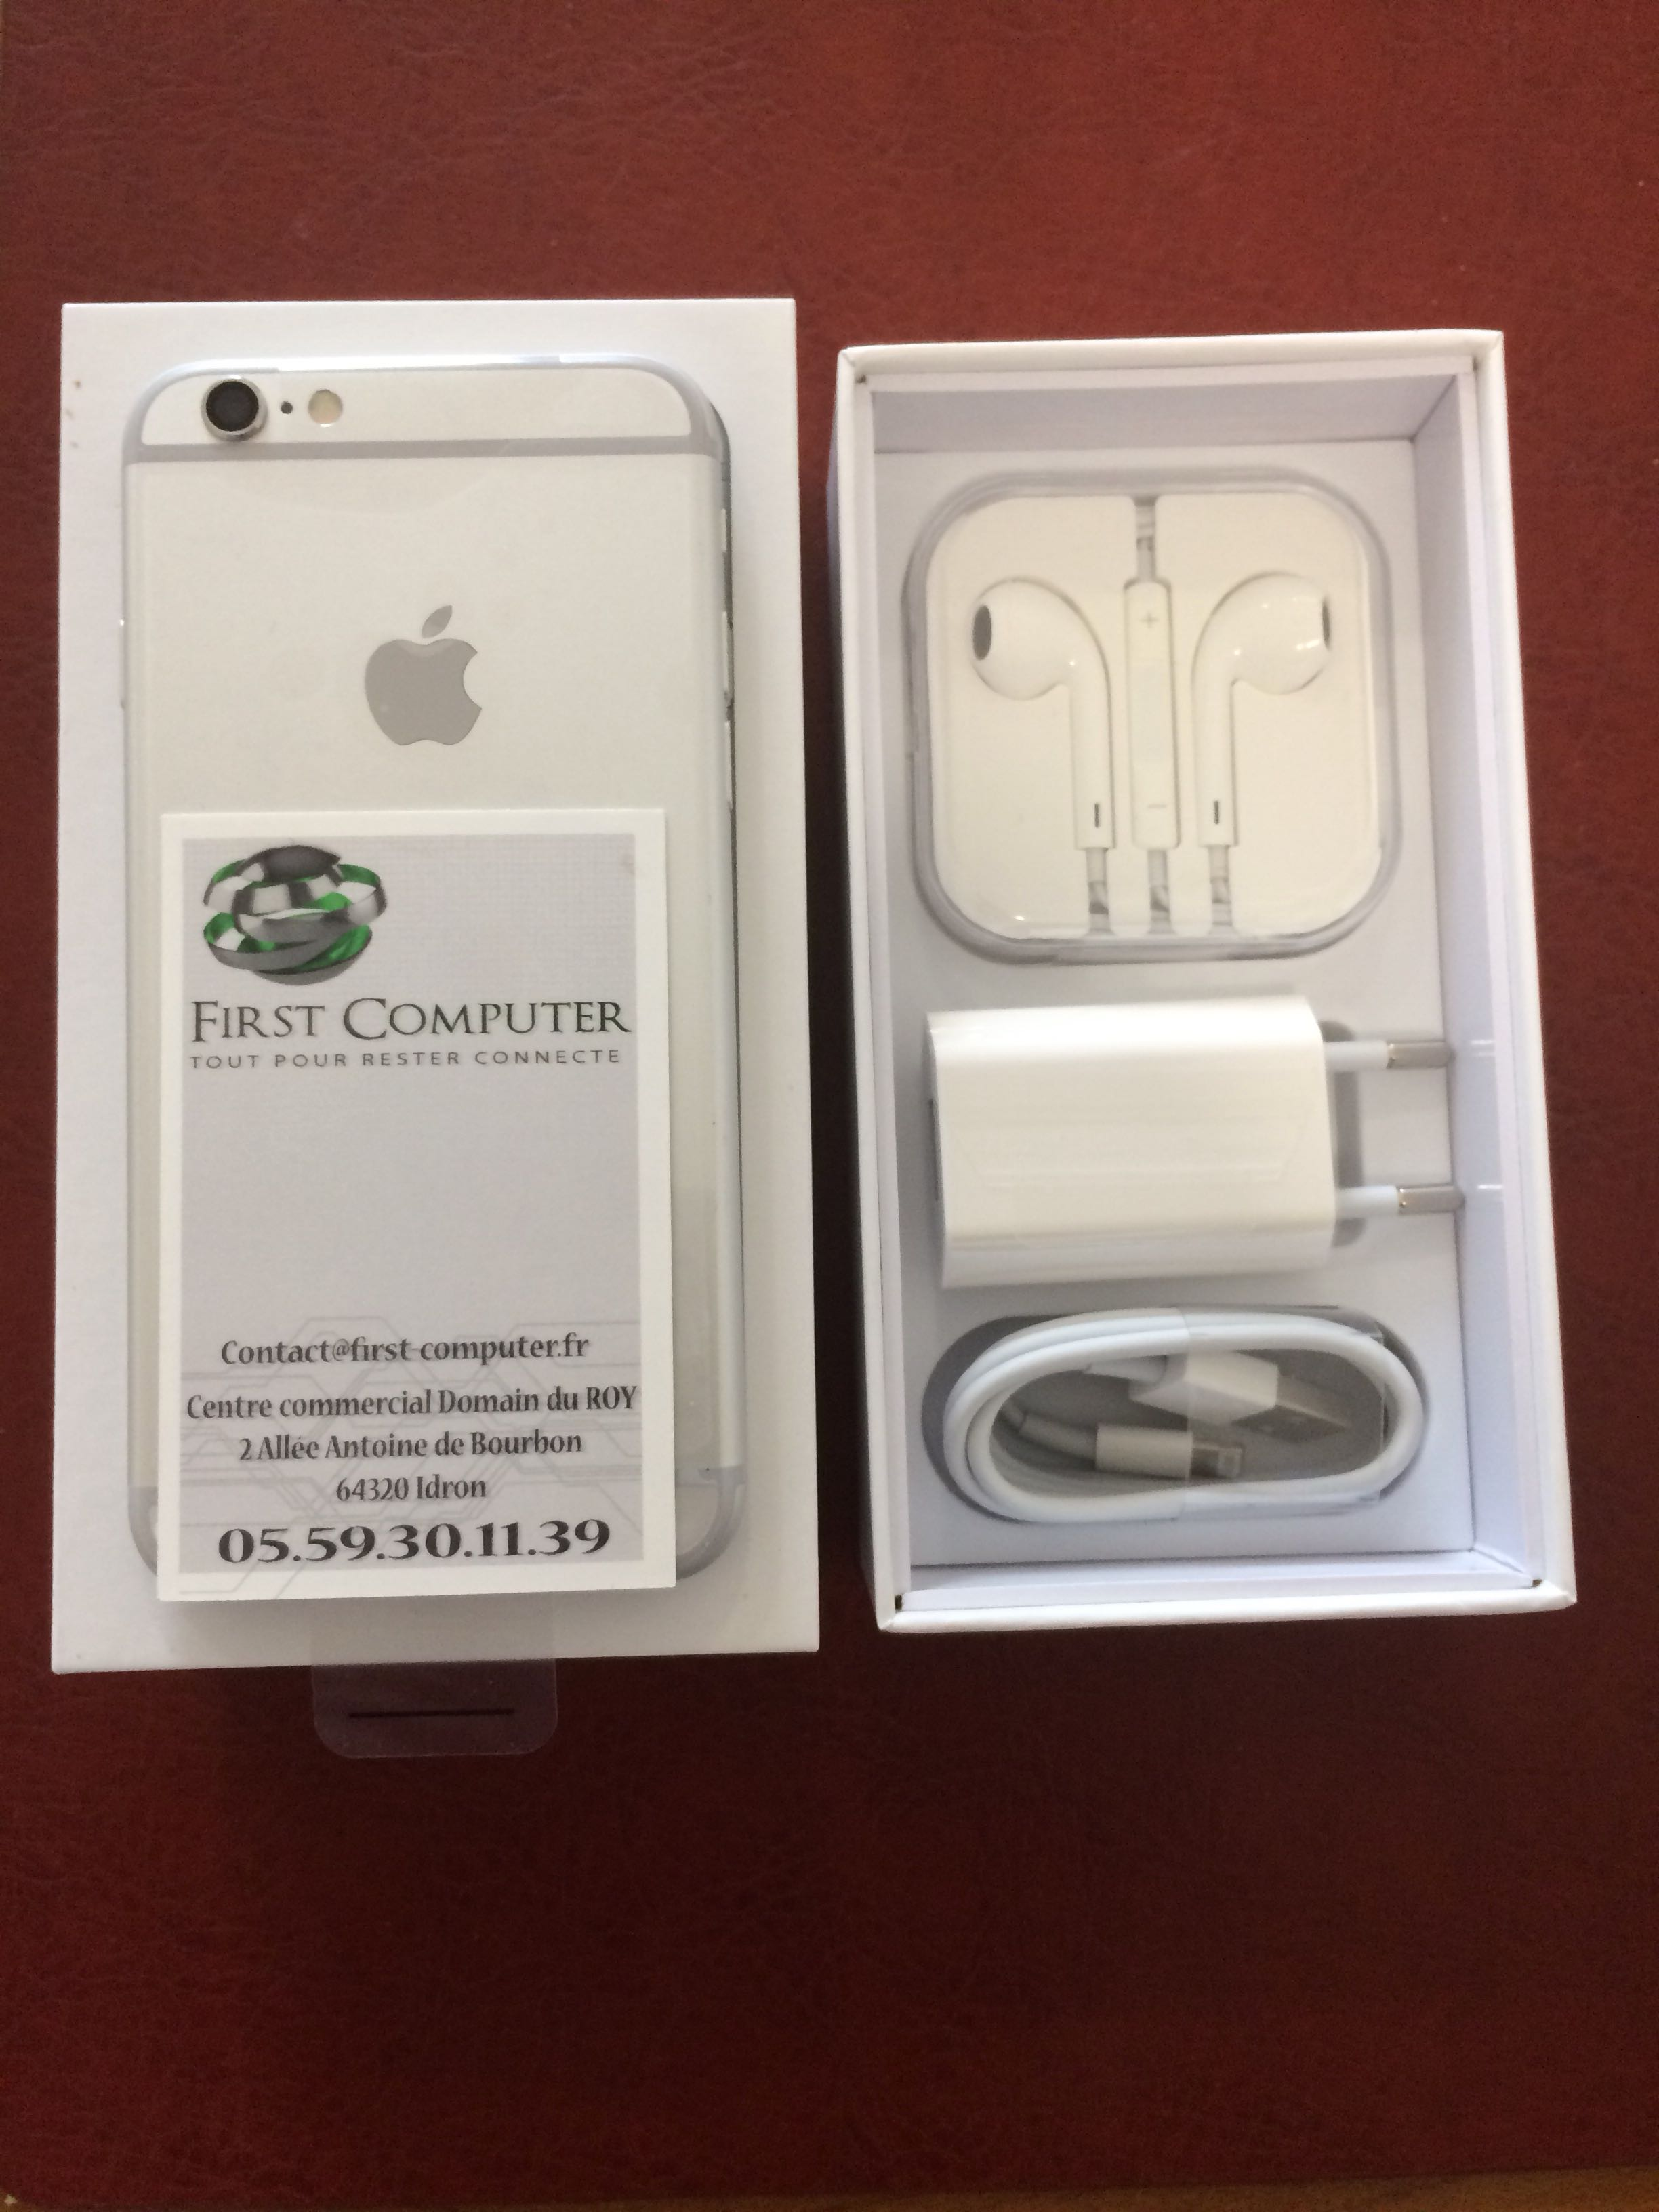 First Computer /Réparation iPhone / iPad /Mac / informatique Pau